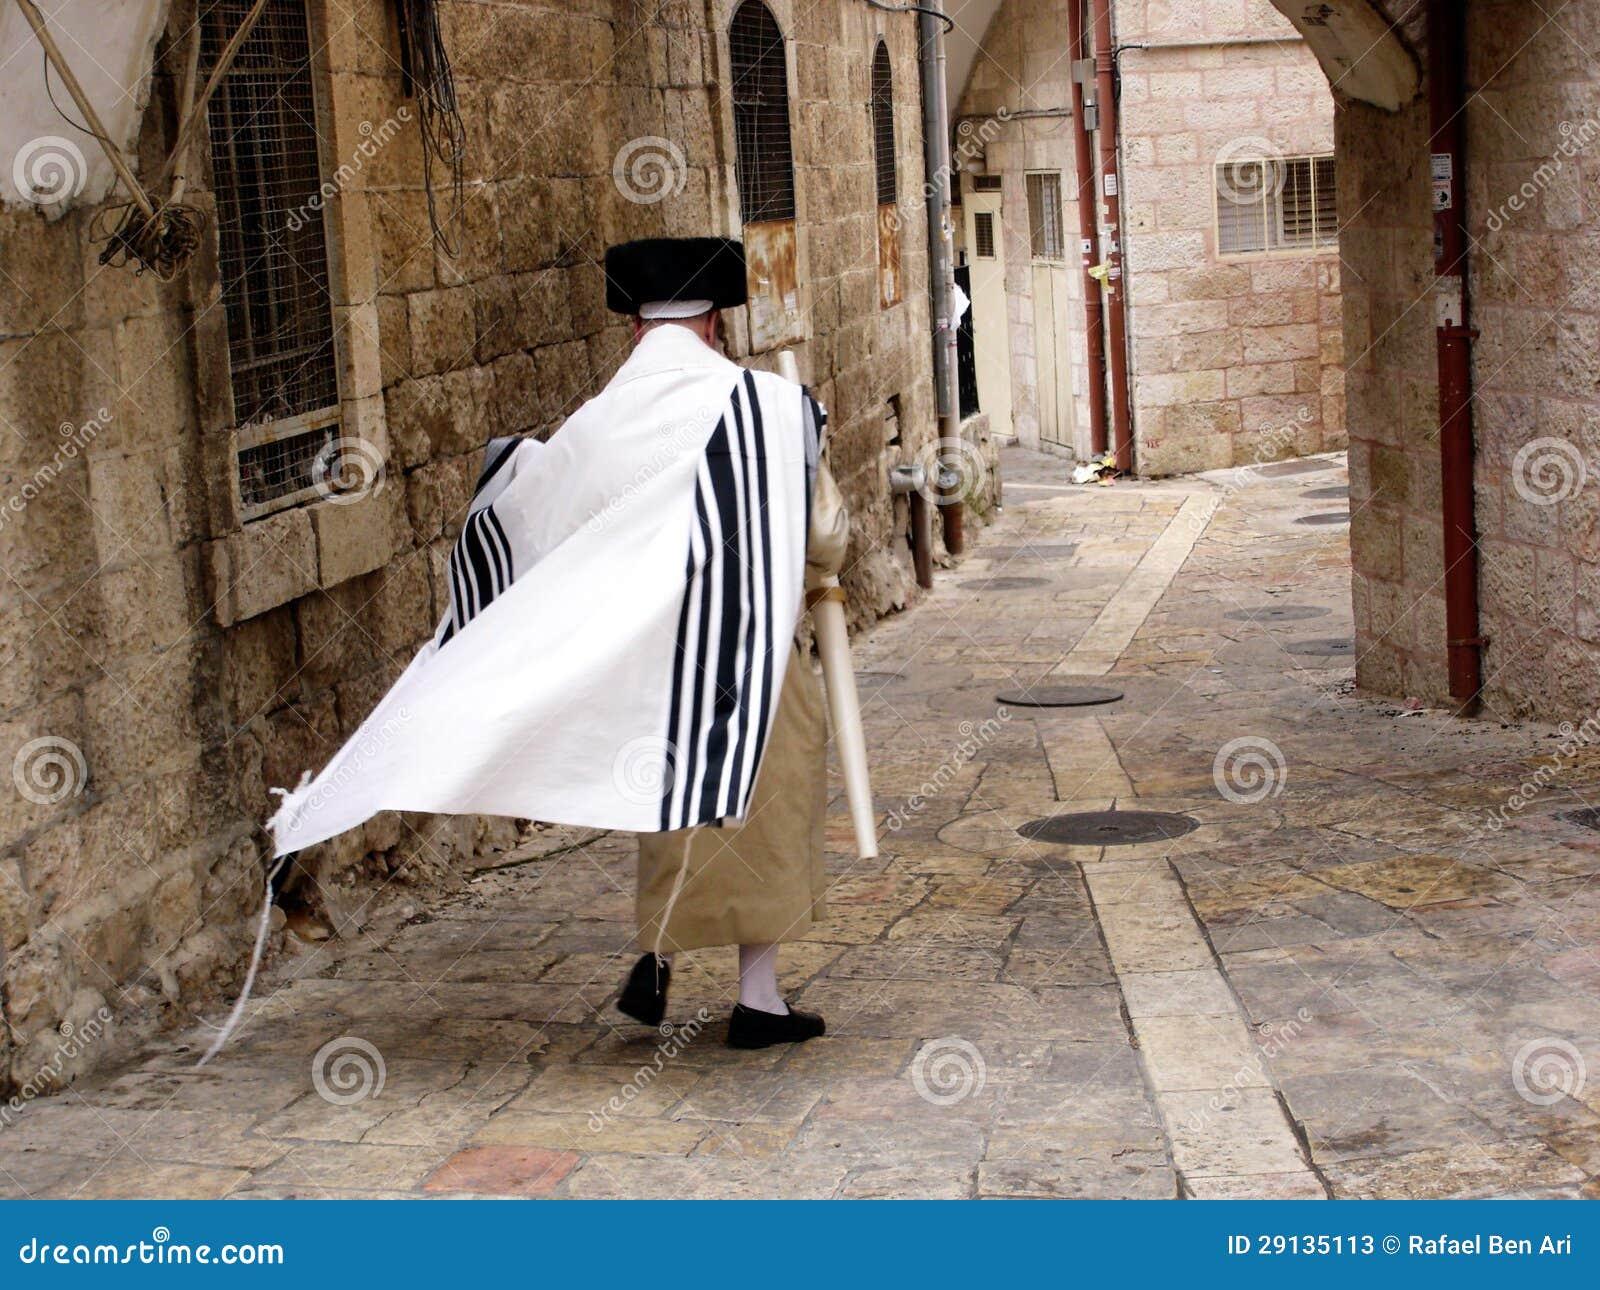 Neighbourhood för Mea Shearim i Jerusalem Israel.